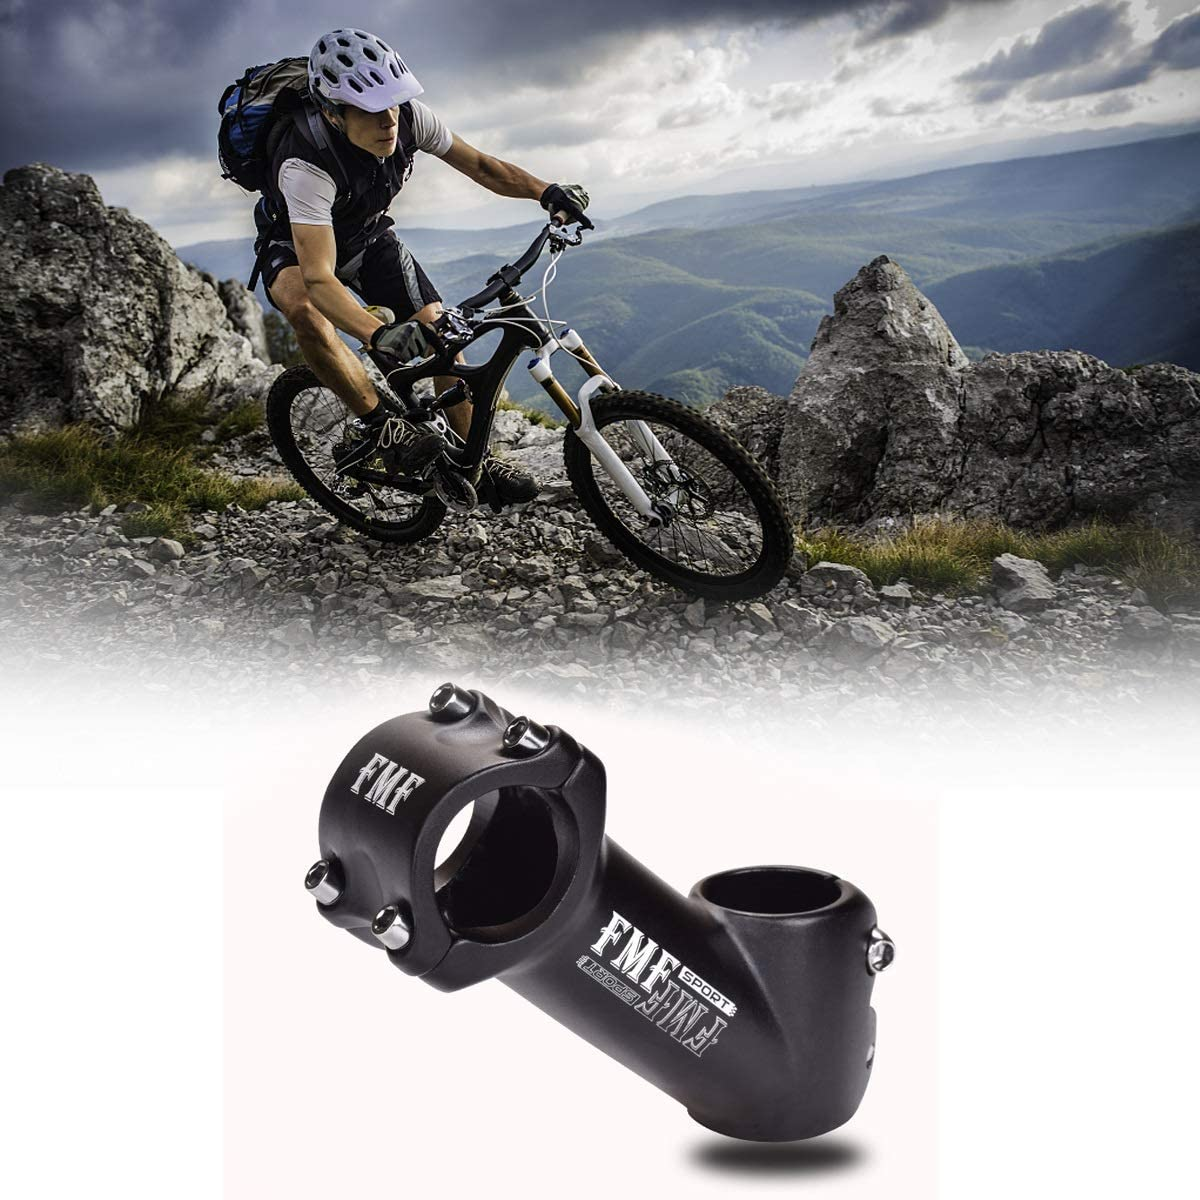 FMF Bike Stem MTB Mountain Bike Stem Aluminum alloy Bicycle Riser 45° 90mm Stem